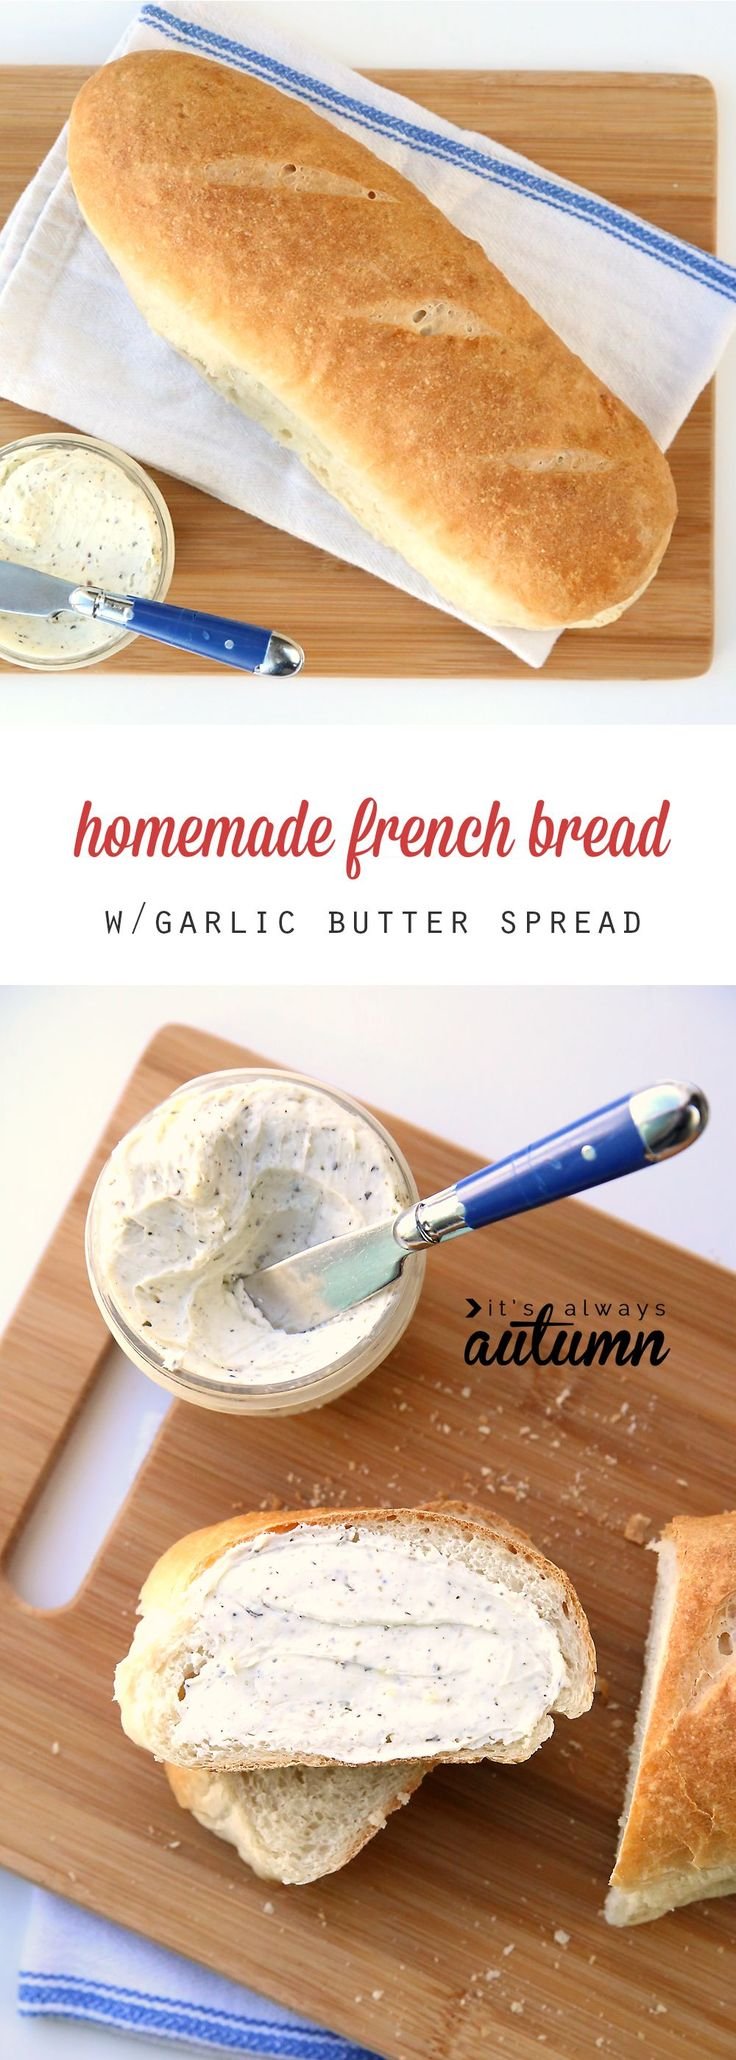 Garlic Tincture How To Make